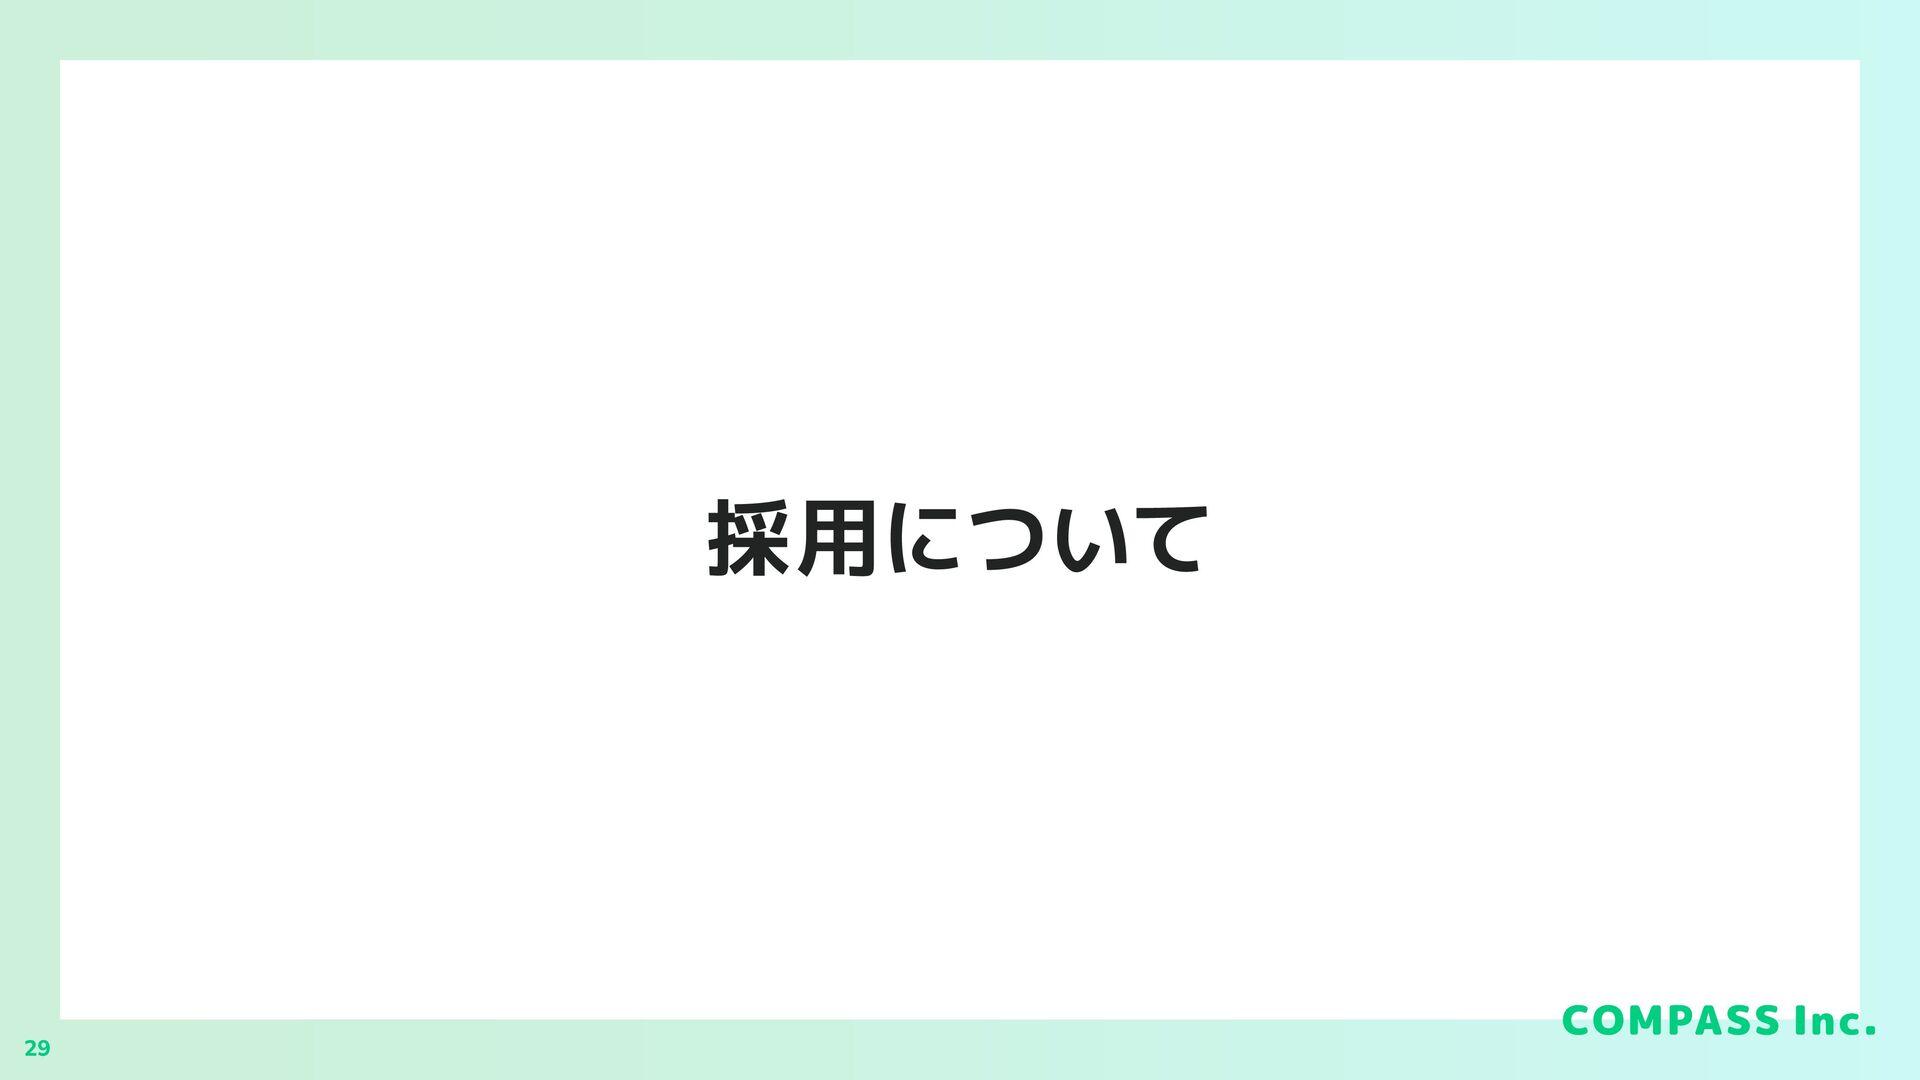 COMPASSの現状と採用ニーズ Qubena 小学算数・中学数学 算数/数学・英語の 2 教...